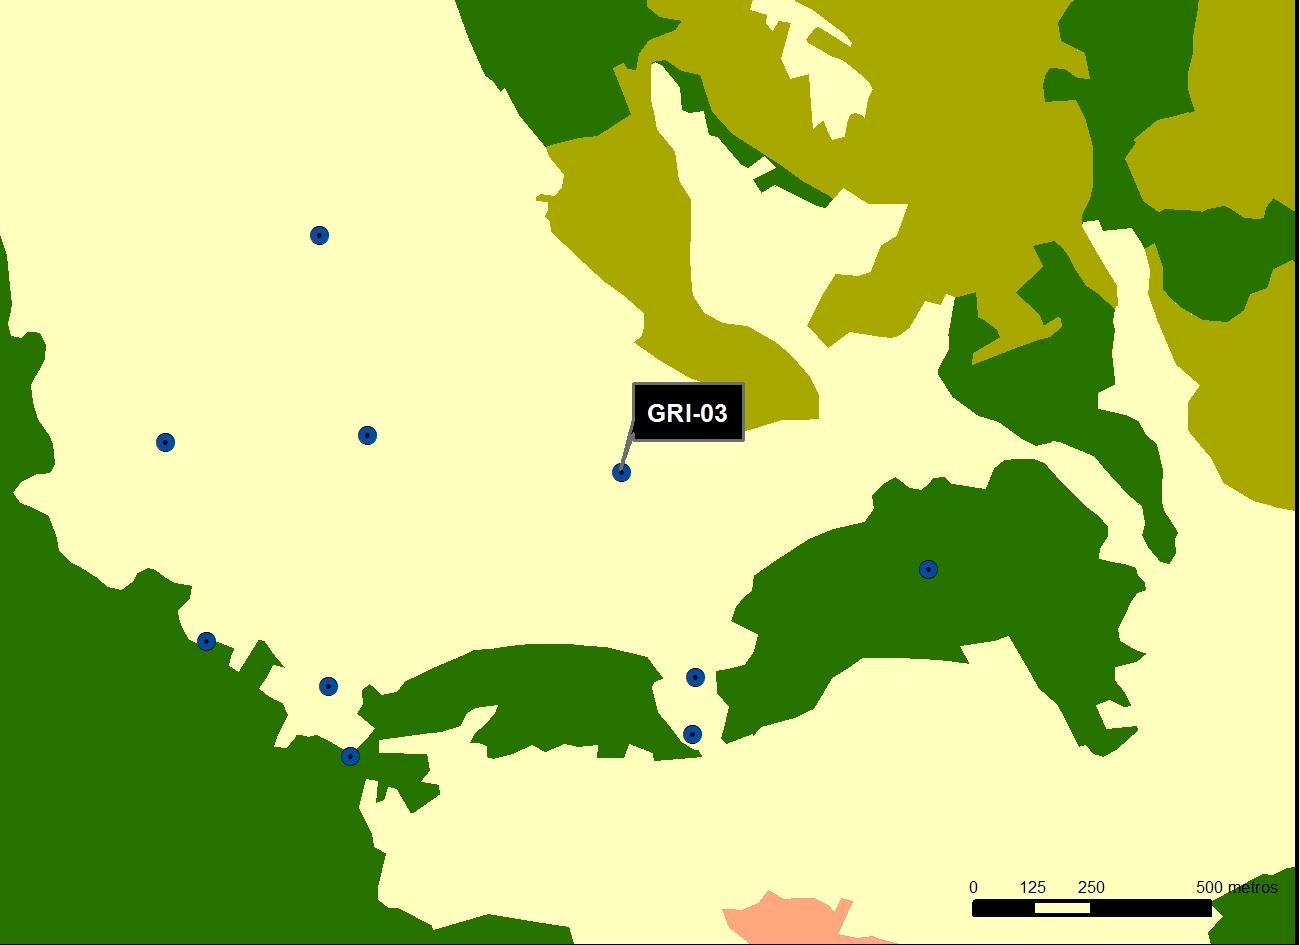 GRI_03_M.V.LOZANO_NUEVA_MAP.VEG